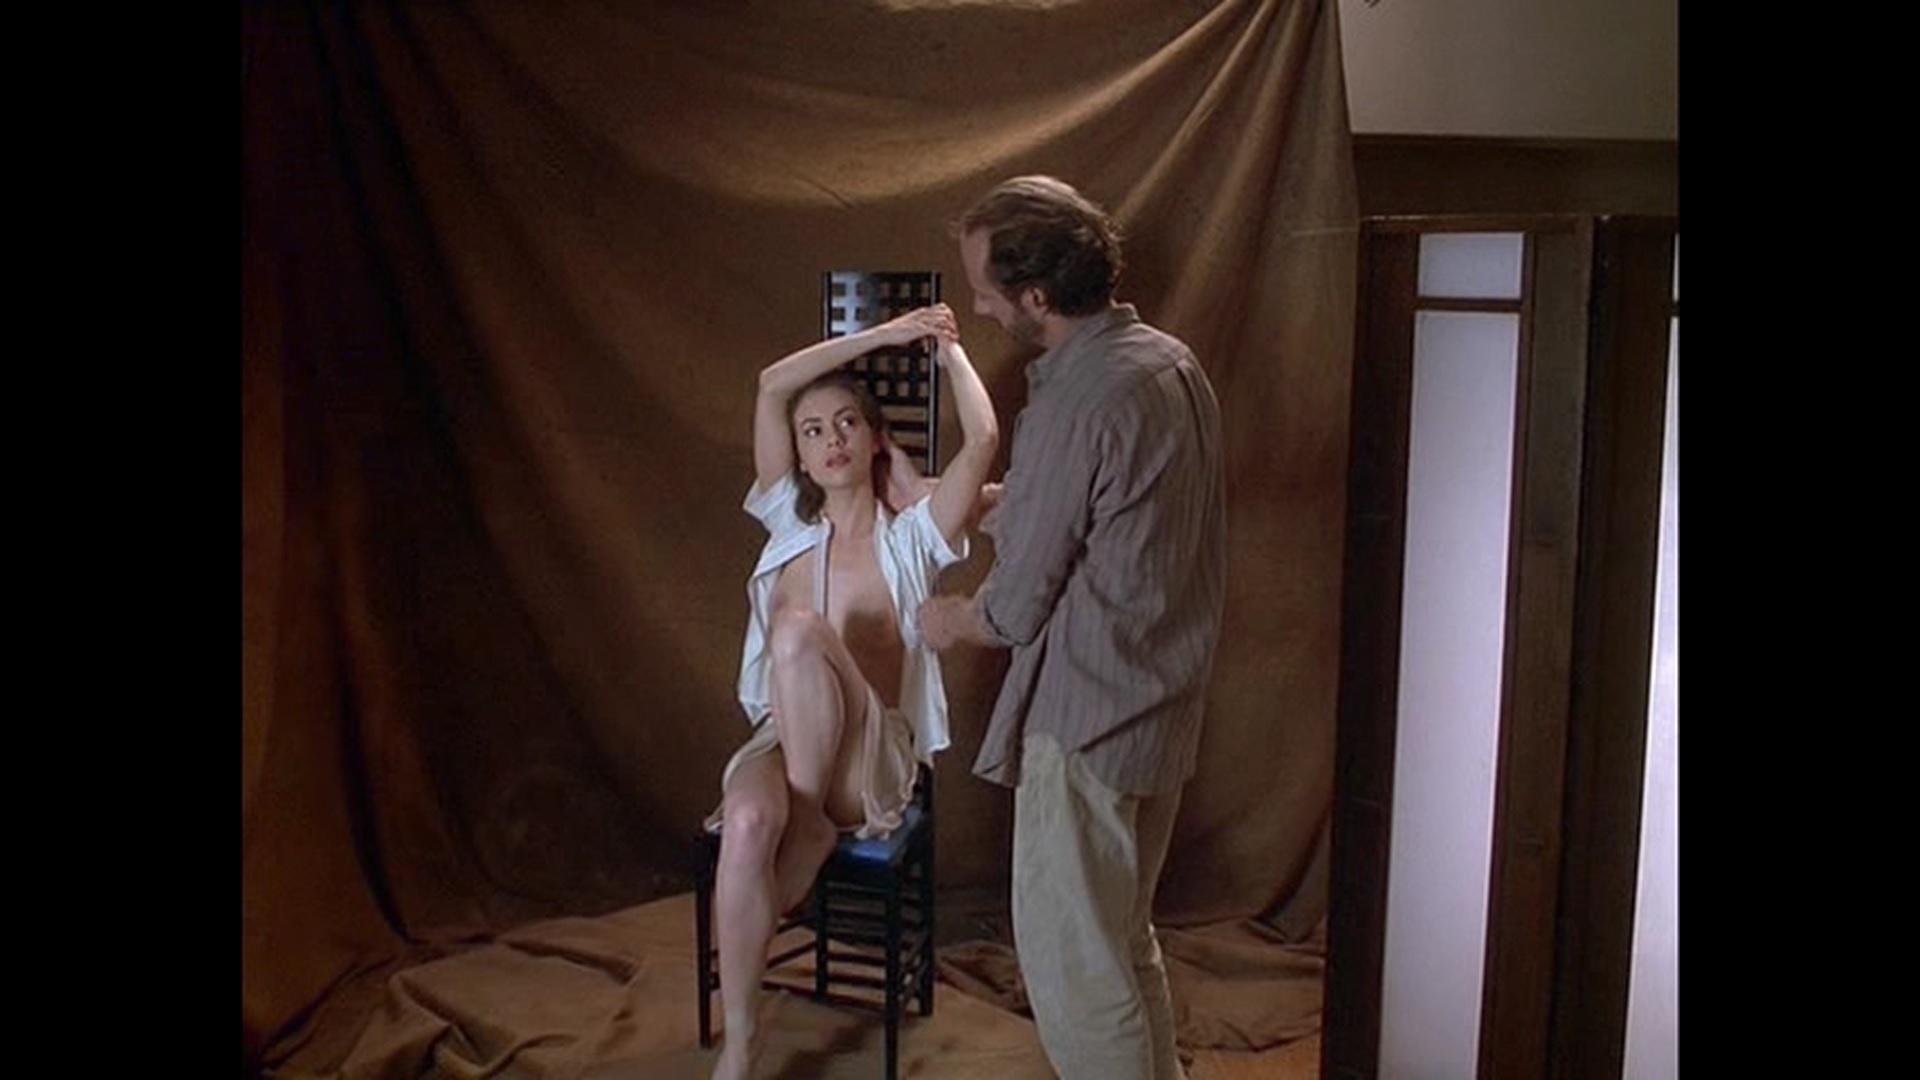 Alyssa Milano Nude Free alyssa milano nude scene in poison ivy 2 movie - free video